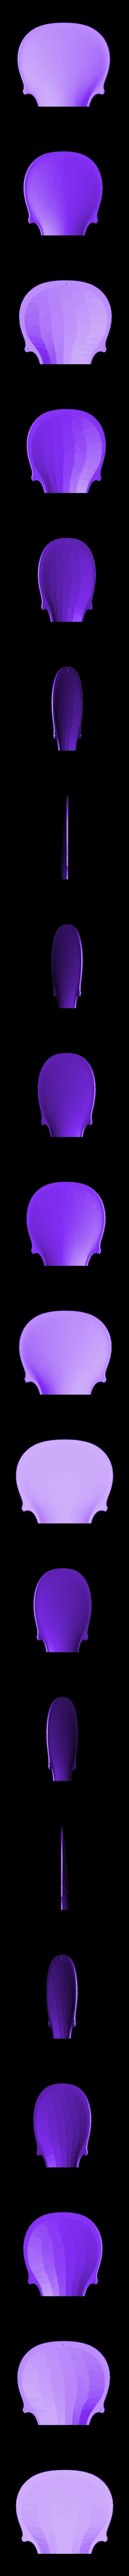 4-back-b.stl Download free STL file Violin • 3D print design, jteix